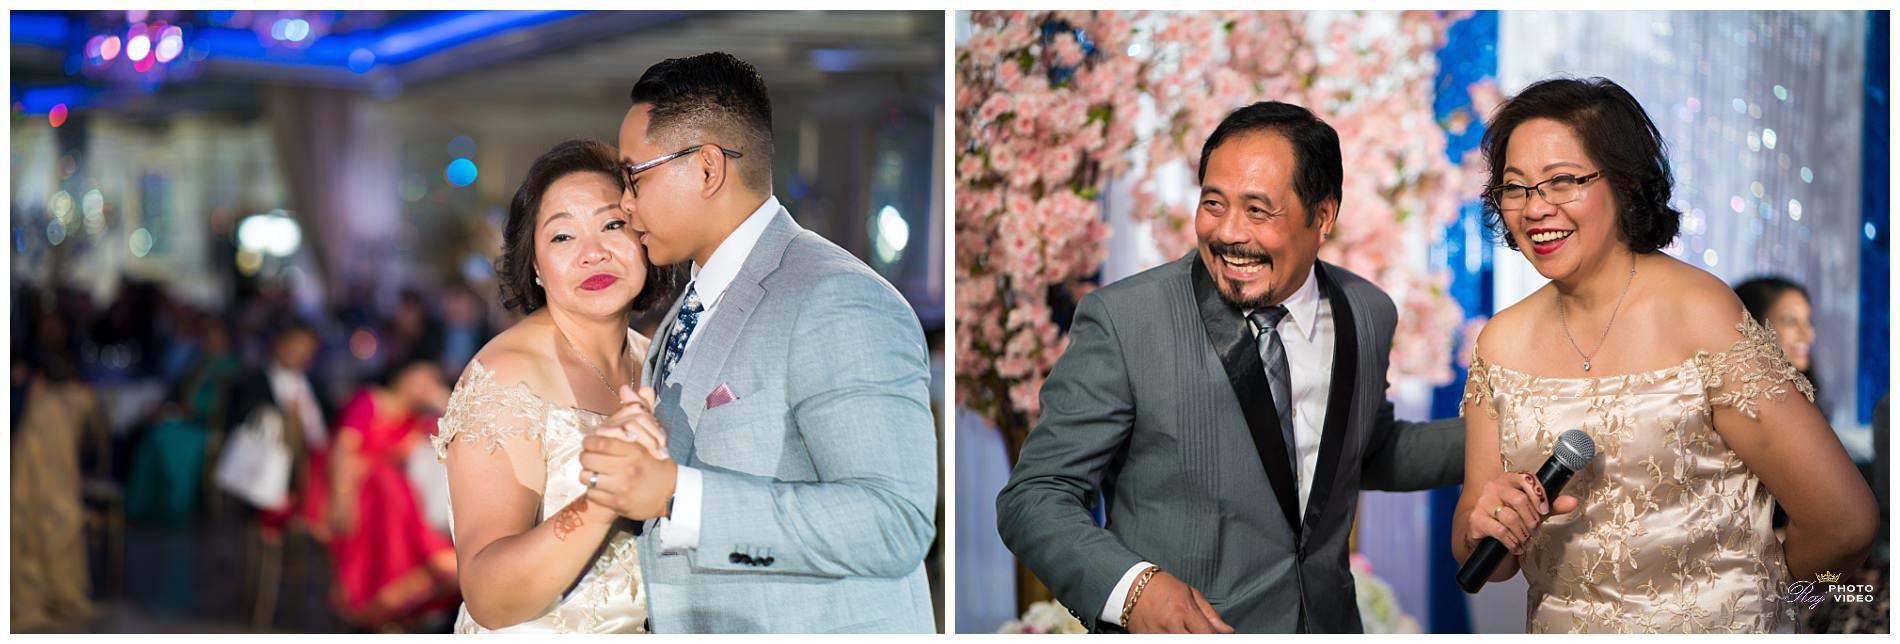 Royal-Manor-Garfield-NJ-Christian-Wedding-Ceremony-Khusbu-Jeff-69.jpg